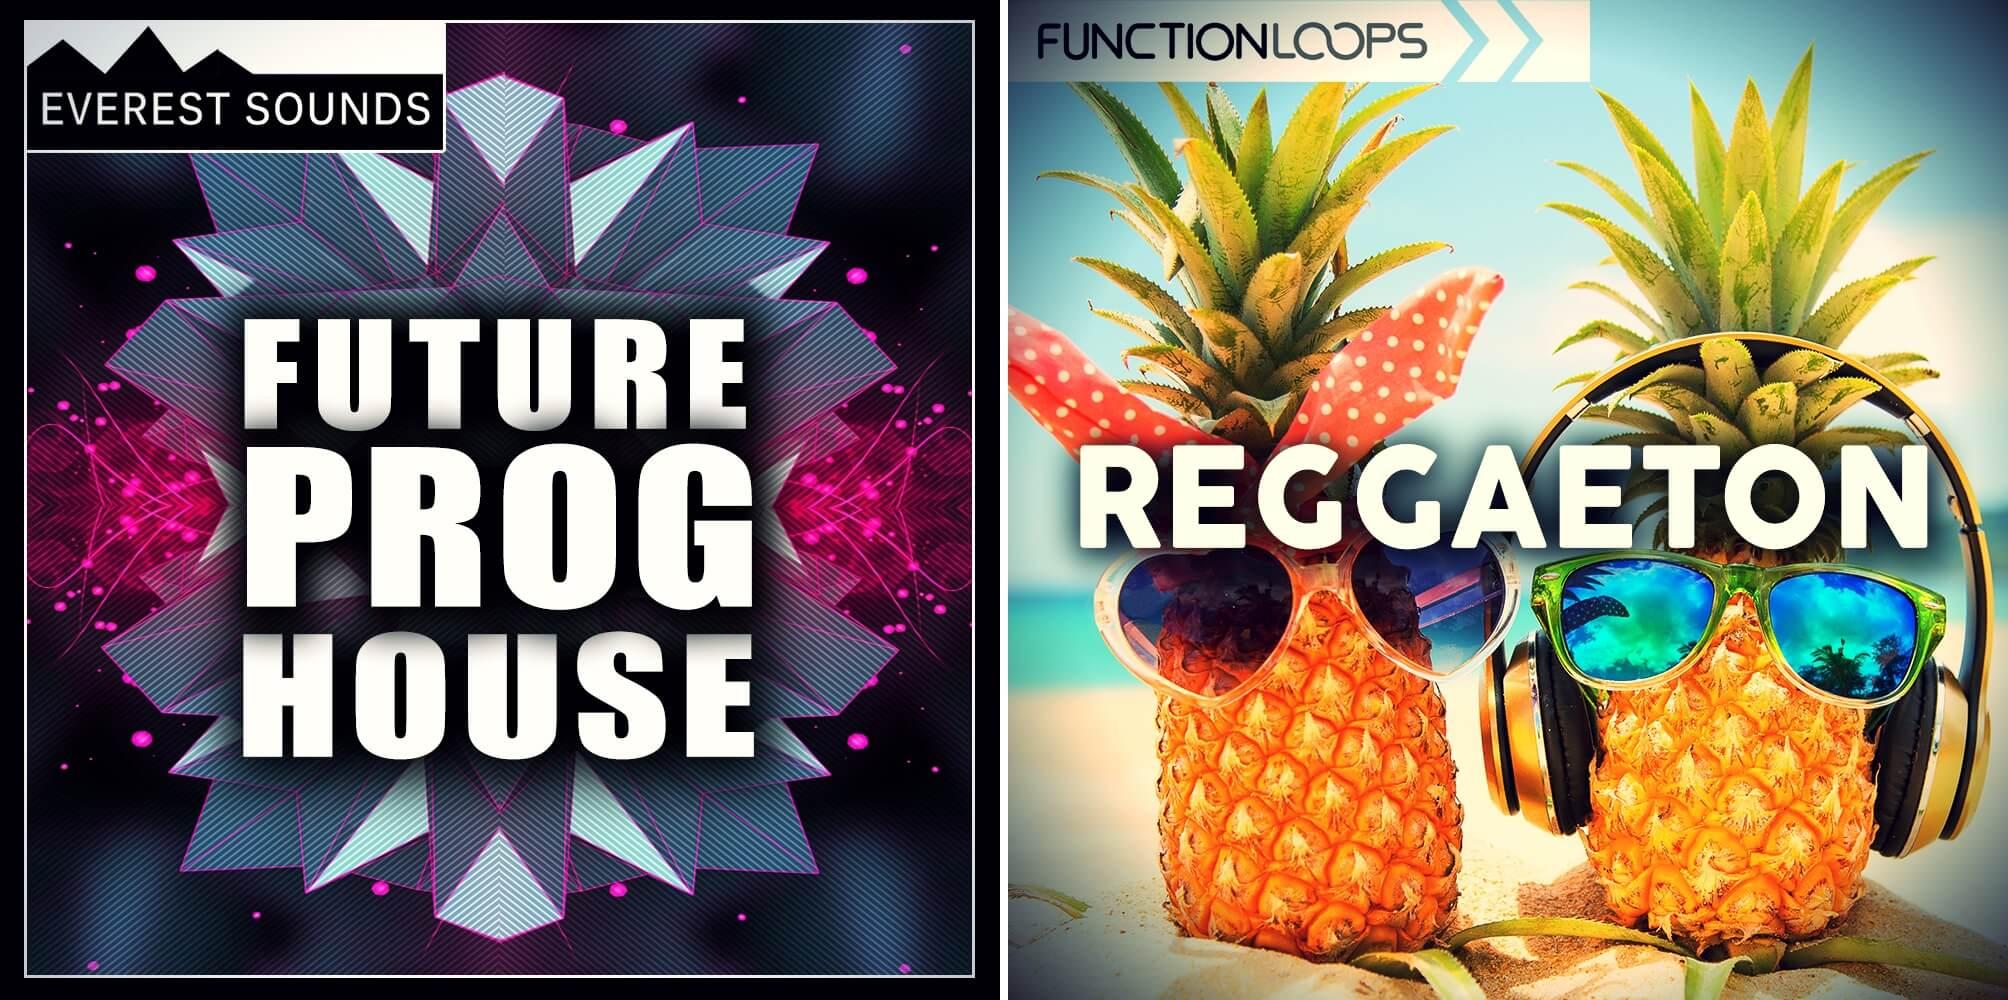 Function Loops Future Prog House and Reggaeton